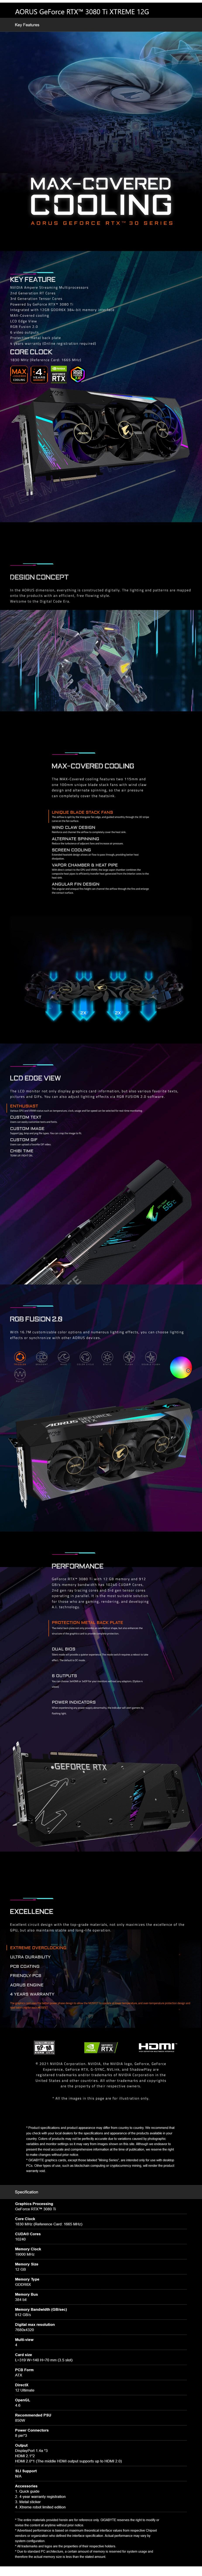 gigabyte-aorus-geforce-rtx-3080-ti-xtreme-12gb-video-card-ac44992-9.jpg